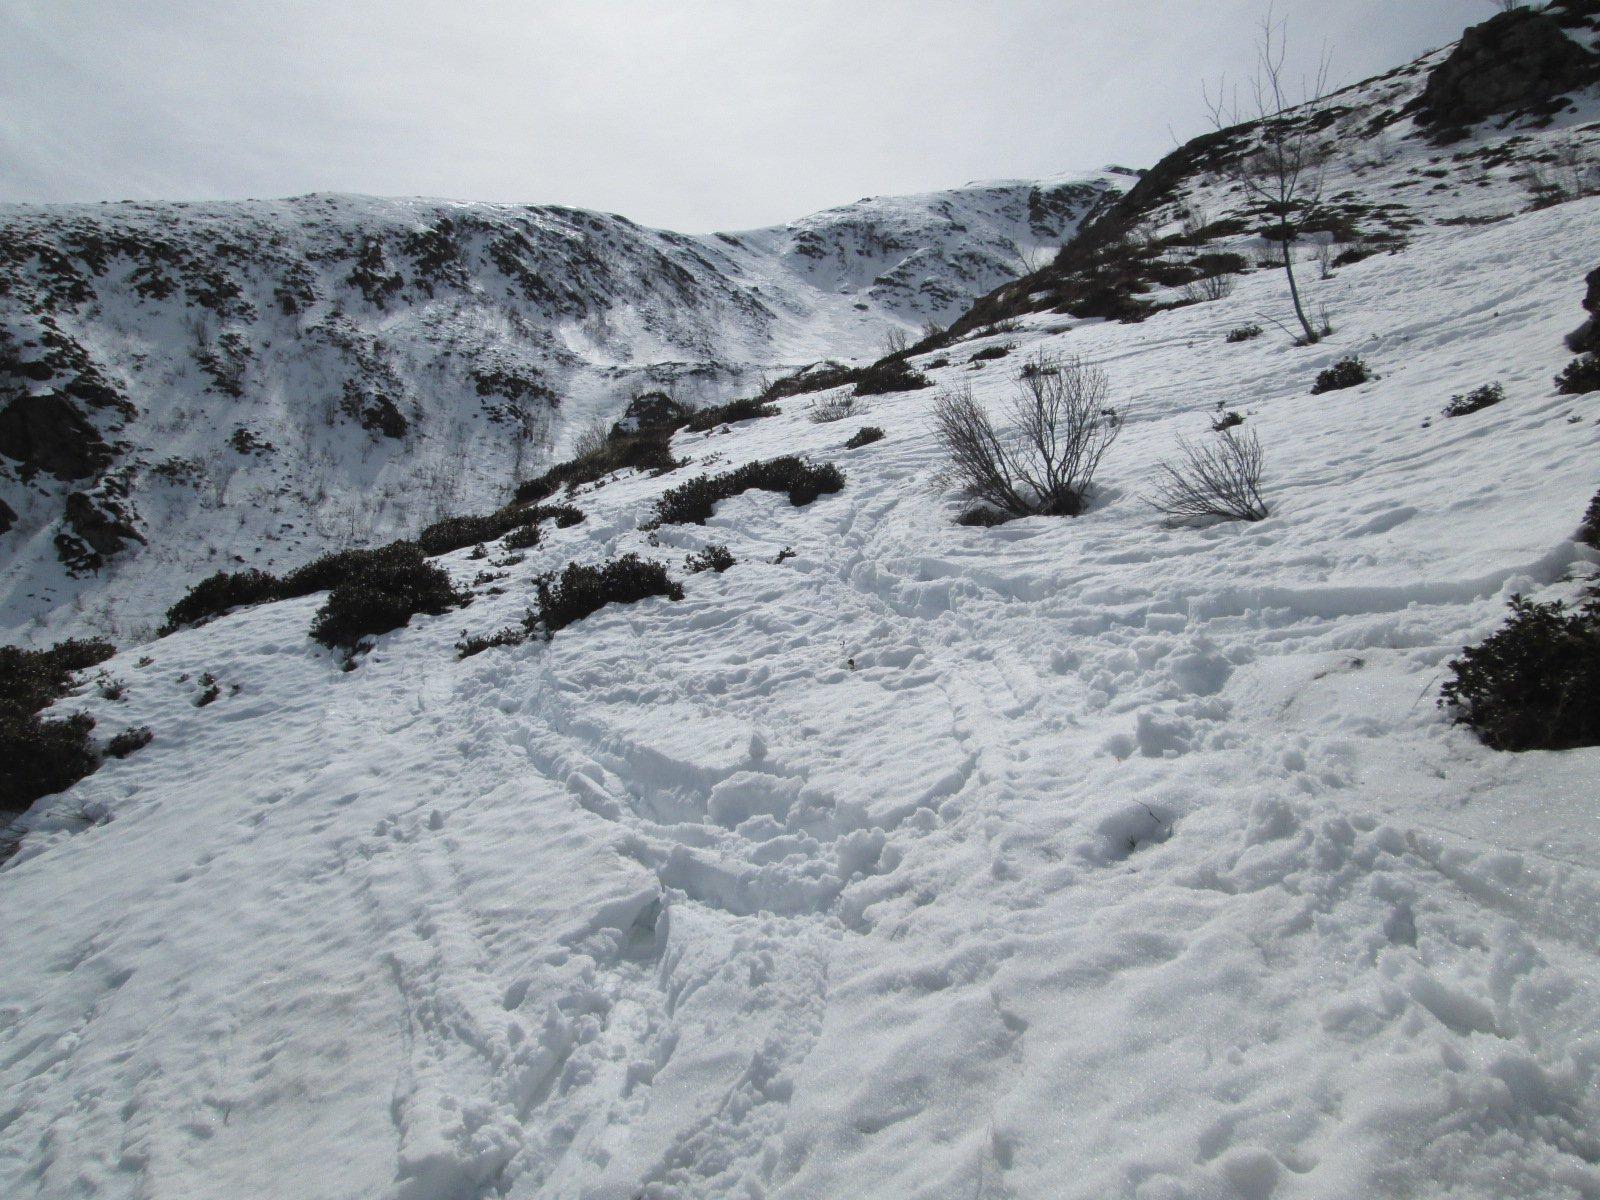 neve pessima sotto i 2.000 metri